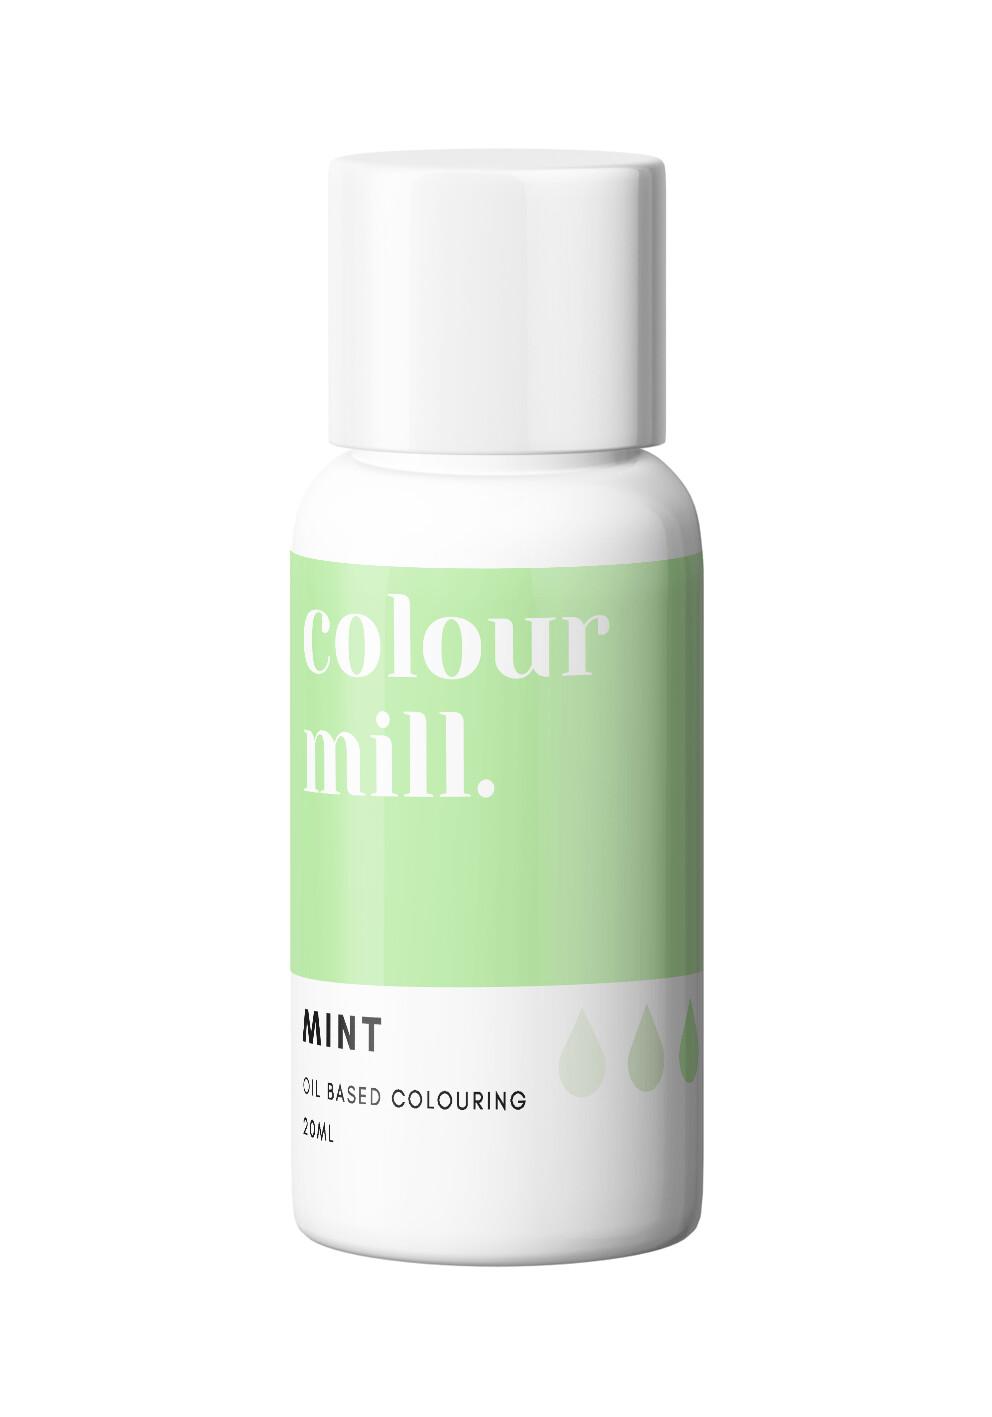 Colour Mill Oil Based Gel Colour -MINT 20ml - Χρώμα Σοκολάτας σε Τζελ Μέντα